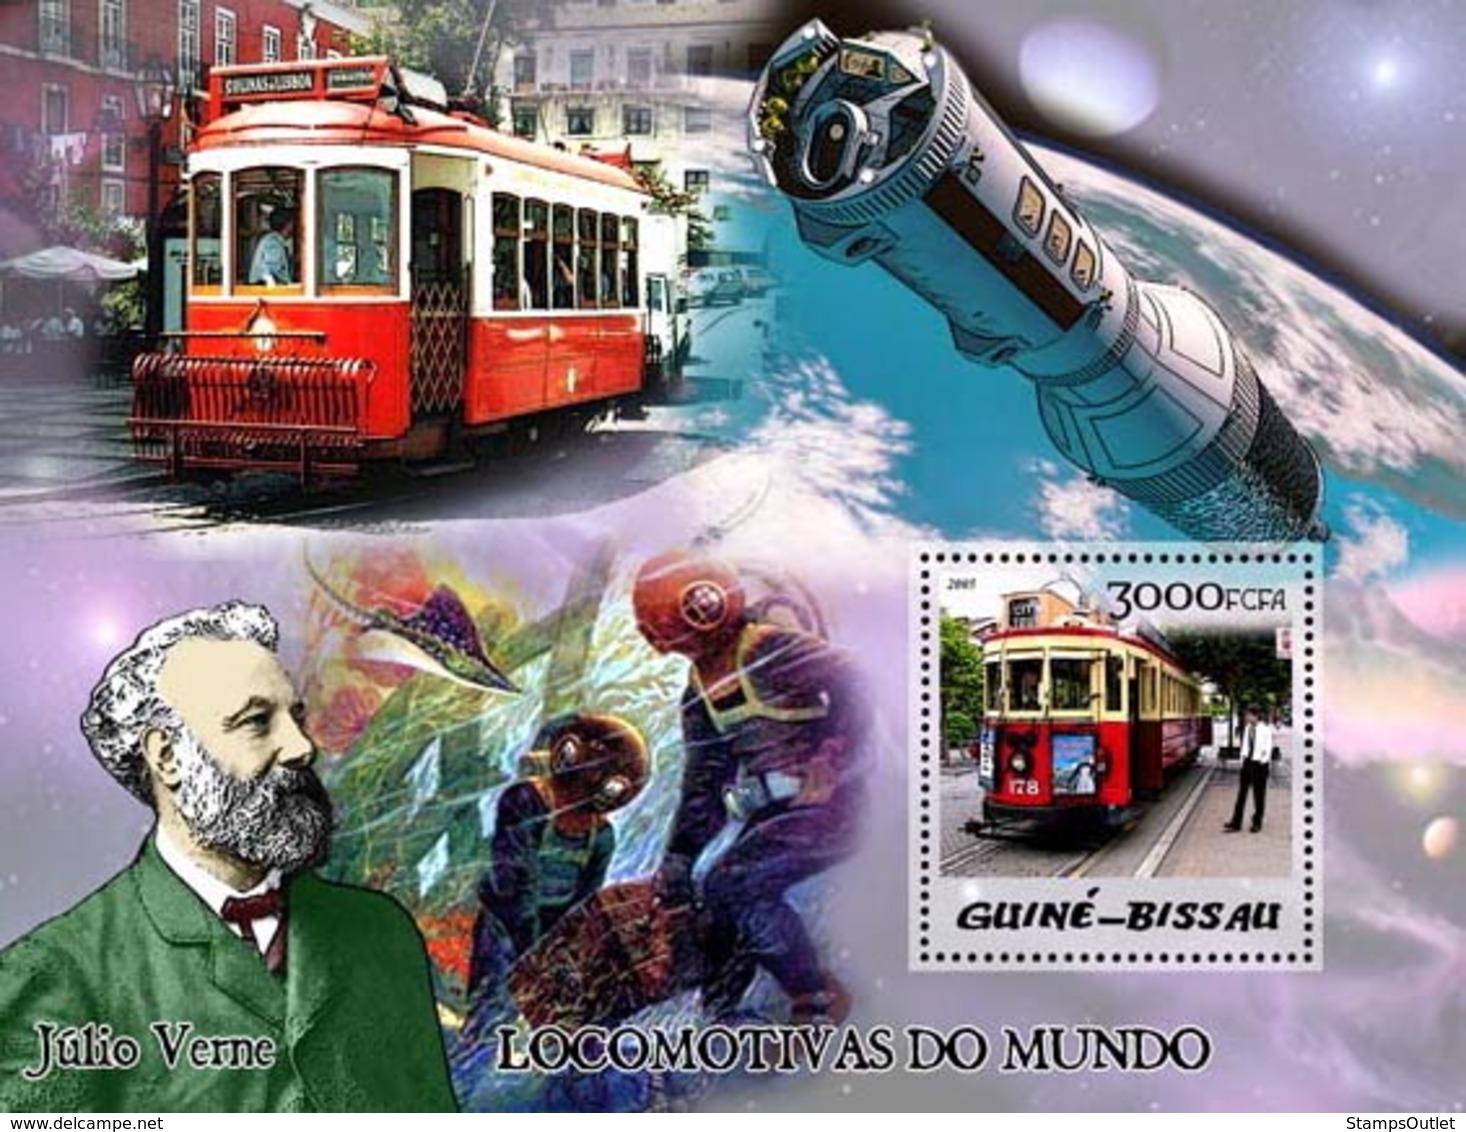 Guinea - Bissau 2005 - Trams & Jules Verne S/s, Y&T 261, Michel 3035/BL506 - Guinea-Bissau